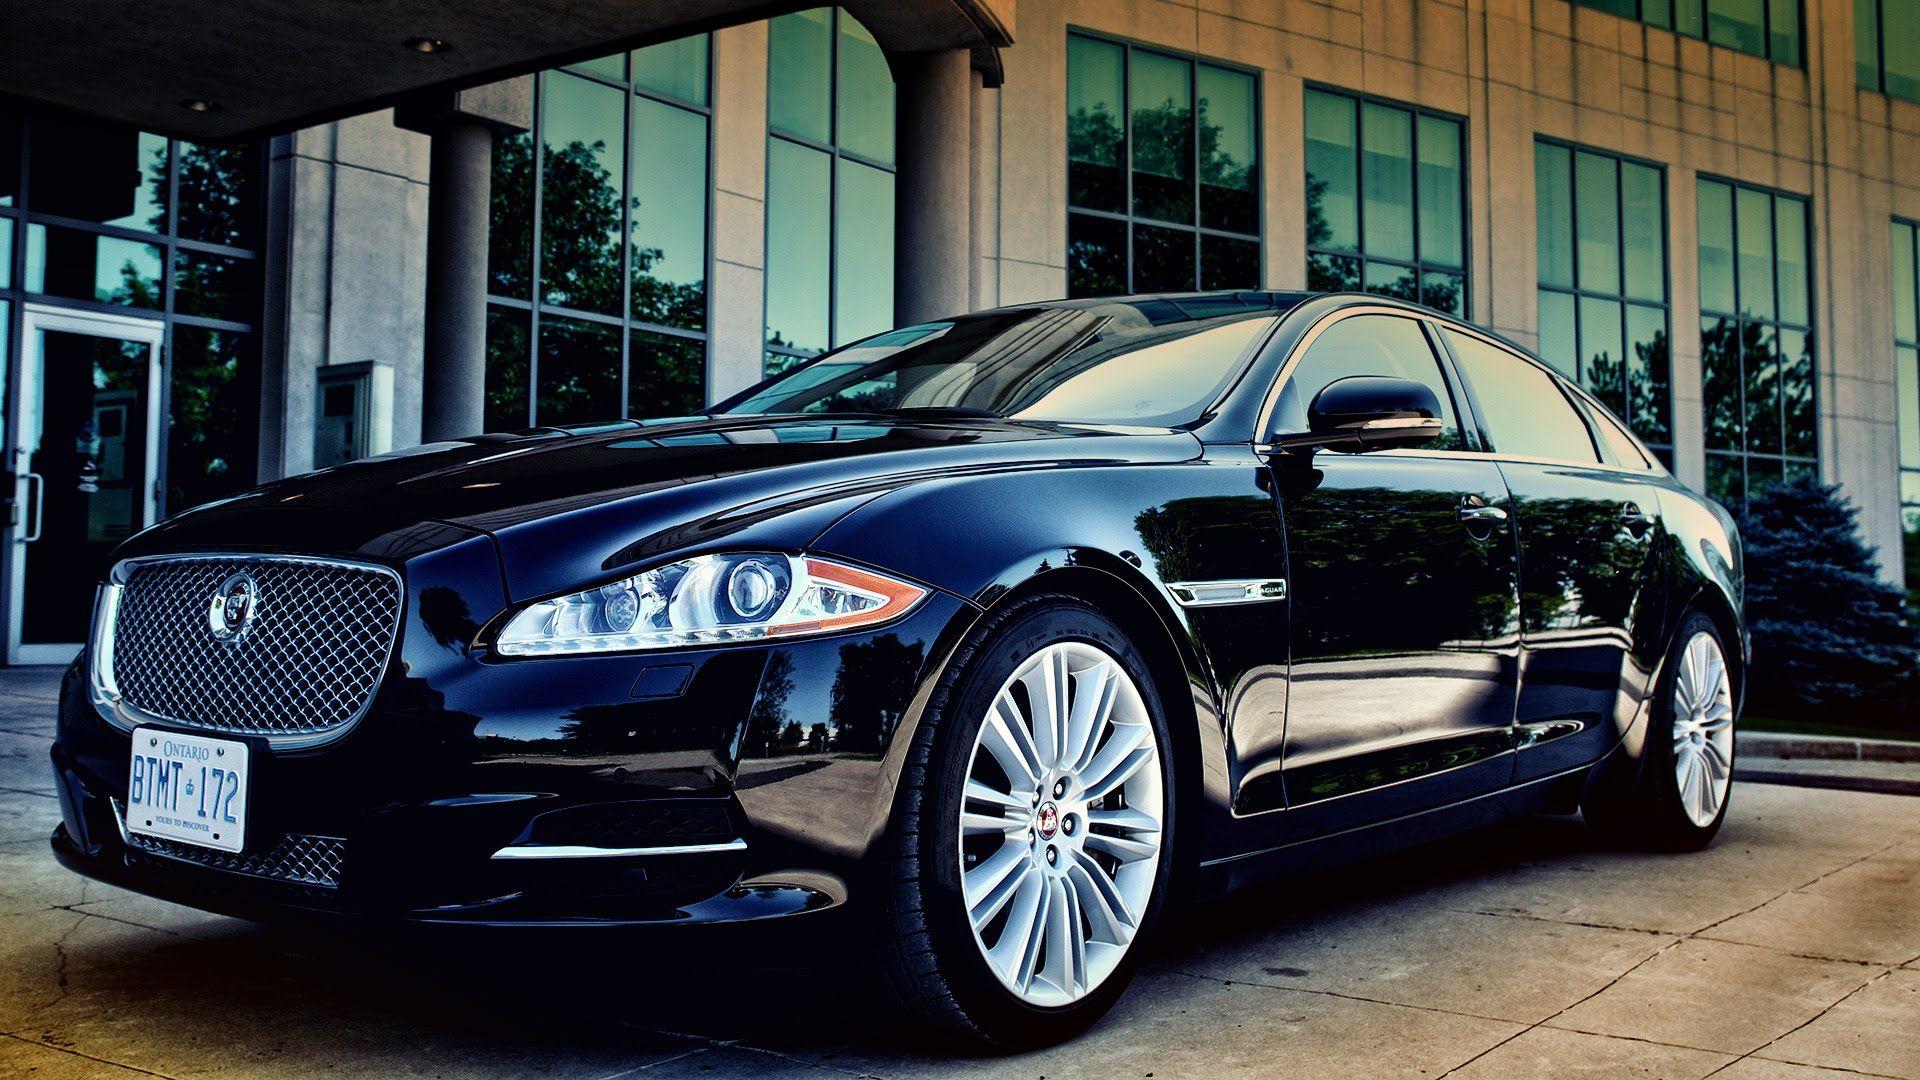 2014 Jaguar Xjl Portfolio Awd Jaguar Xjl Luxury Sedan Jaguar